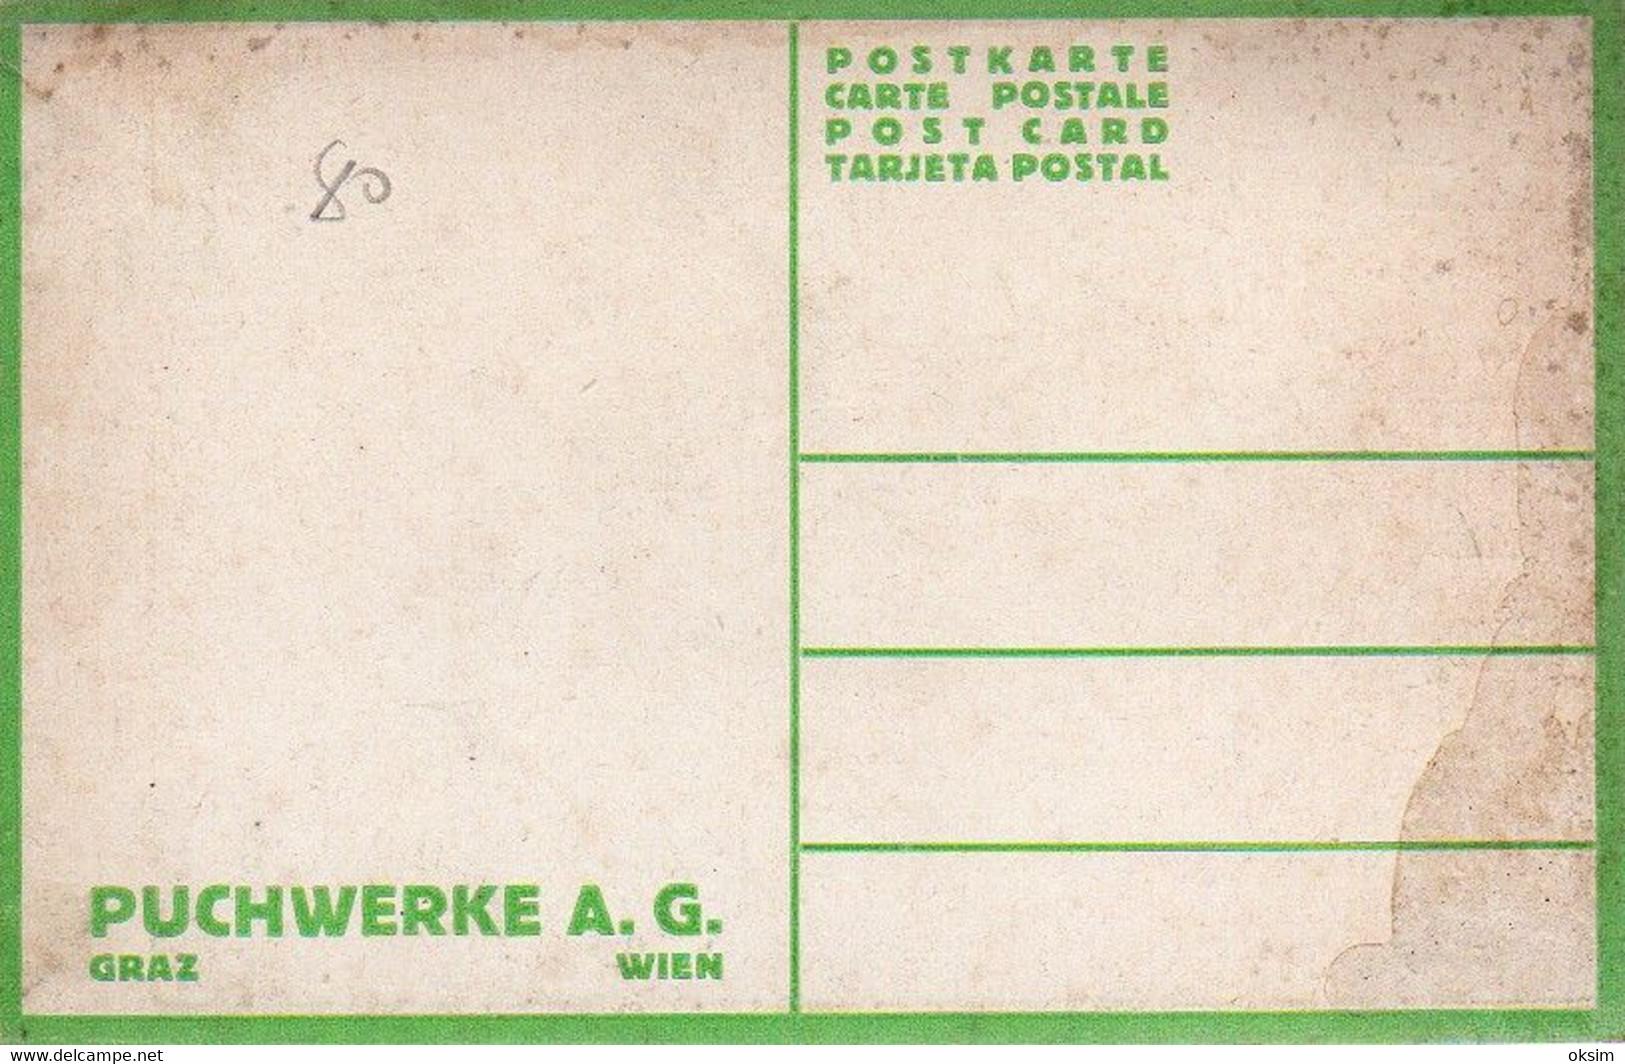 PUCH, F. ZWICKL, PUCHWERKE A. G., GRAZ, WIEN, MOTORRAD, MOTORCYCLE - Advertising